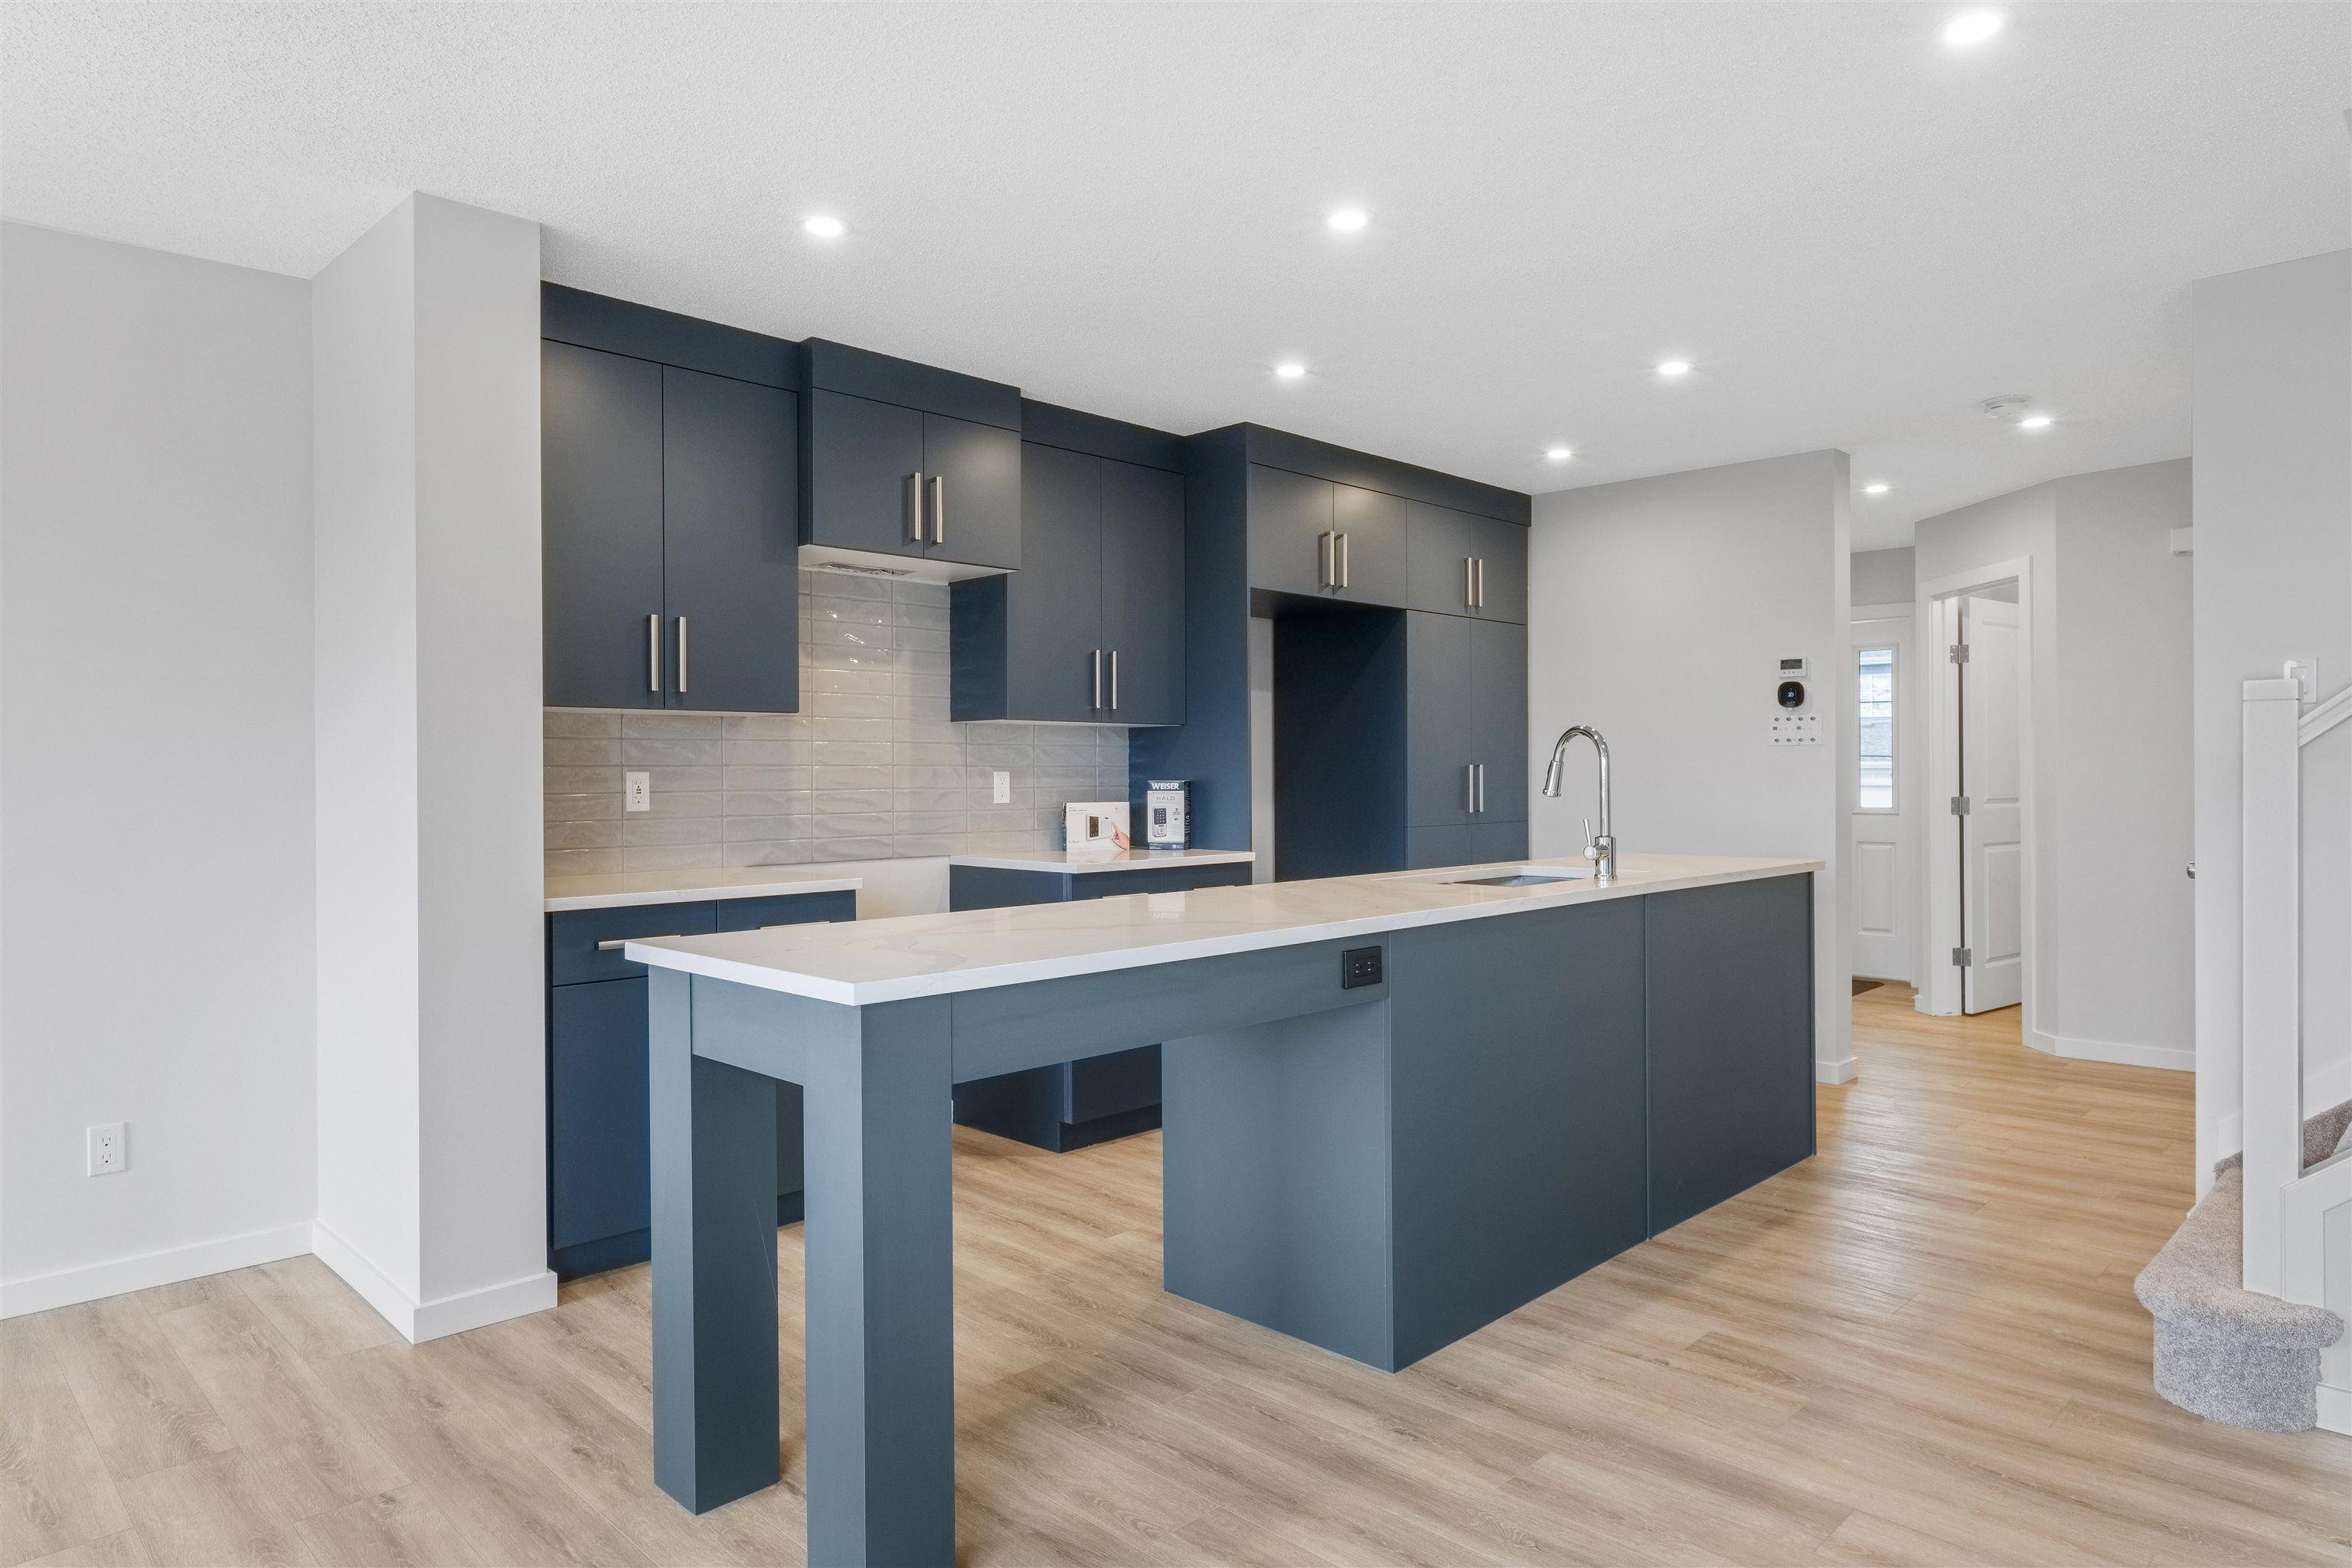 Main Photo: 9317 Pear Link in Edmonton: Zone 53 House Half Duplex for sale : MLS®# E4263220